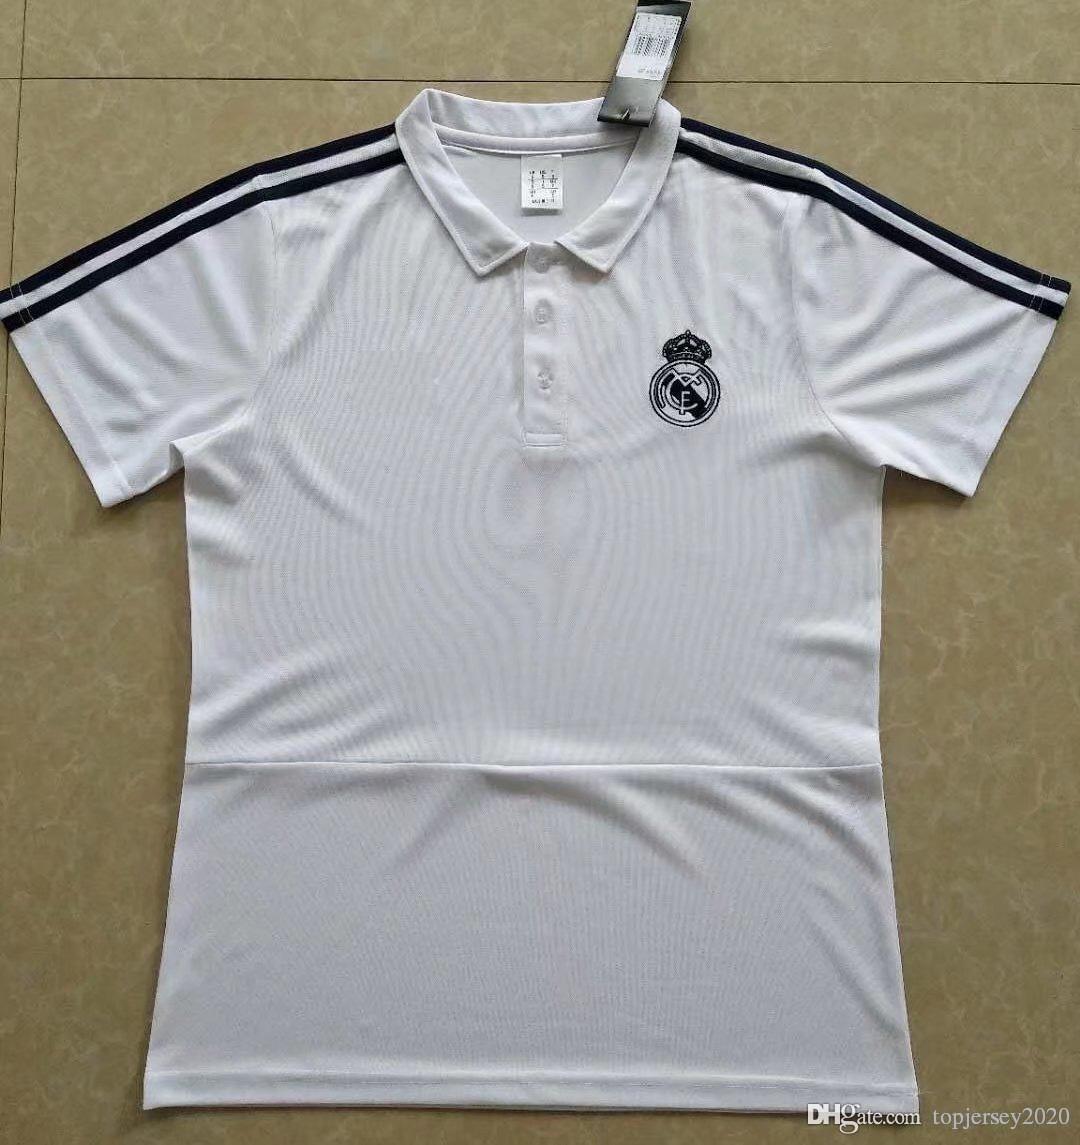 Thai 18 19 Real Madrid POLO Camisa Ronaldo Soccer Kit 2018 2019 Jerseys De  Fútbol Madrid Real KROOS ASENSIO Jersey De Entrenamiento Por Topjersey2020 5f08e5a7fb8d7